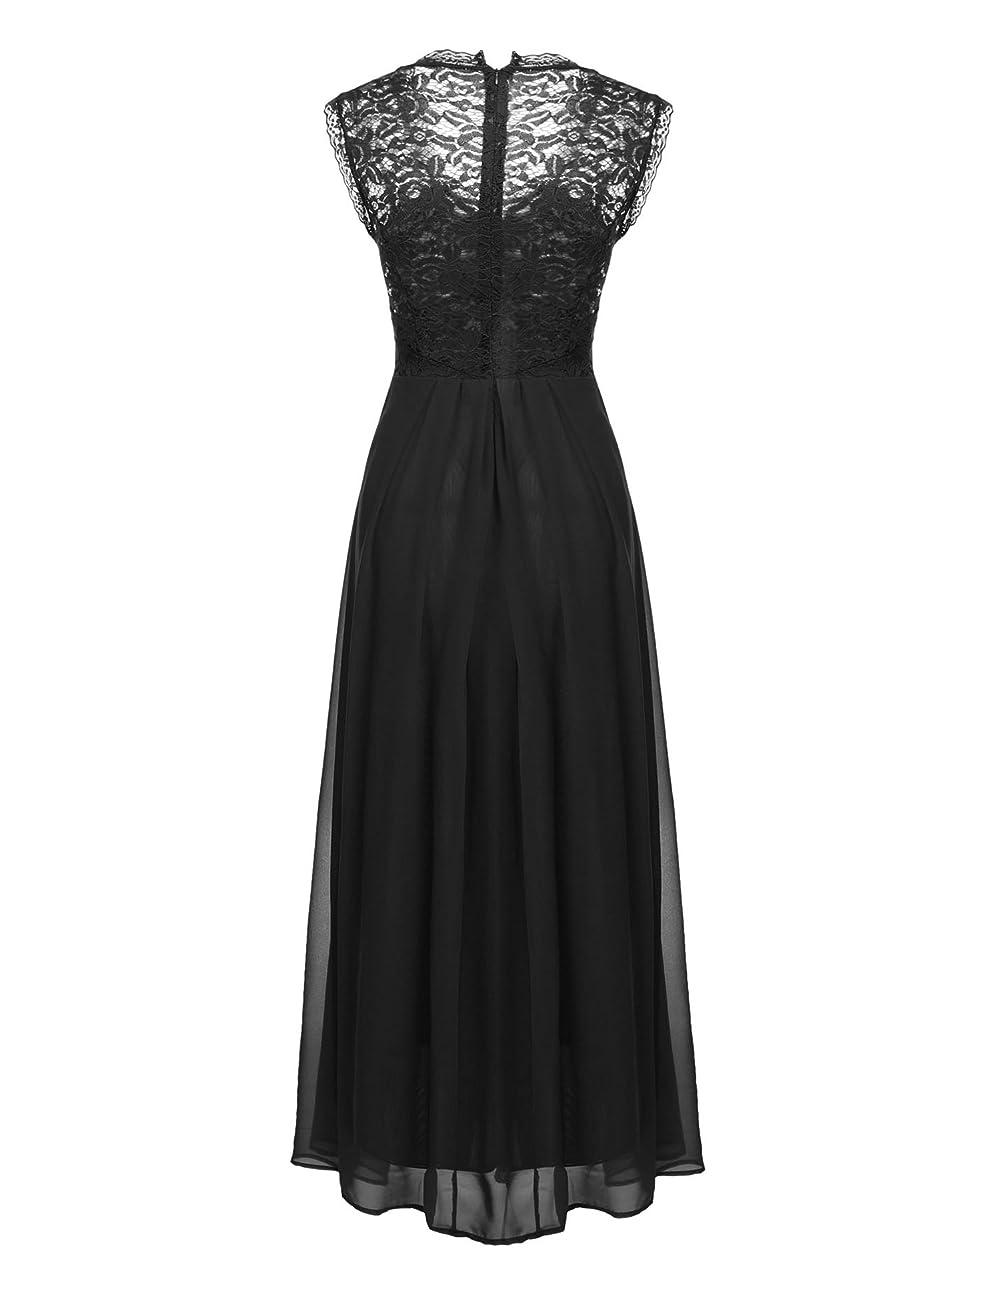 ANGVNS Women's Casual Deep- V Neck Sleeveless Vintage Maxi Dress 4